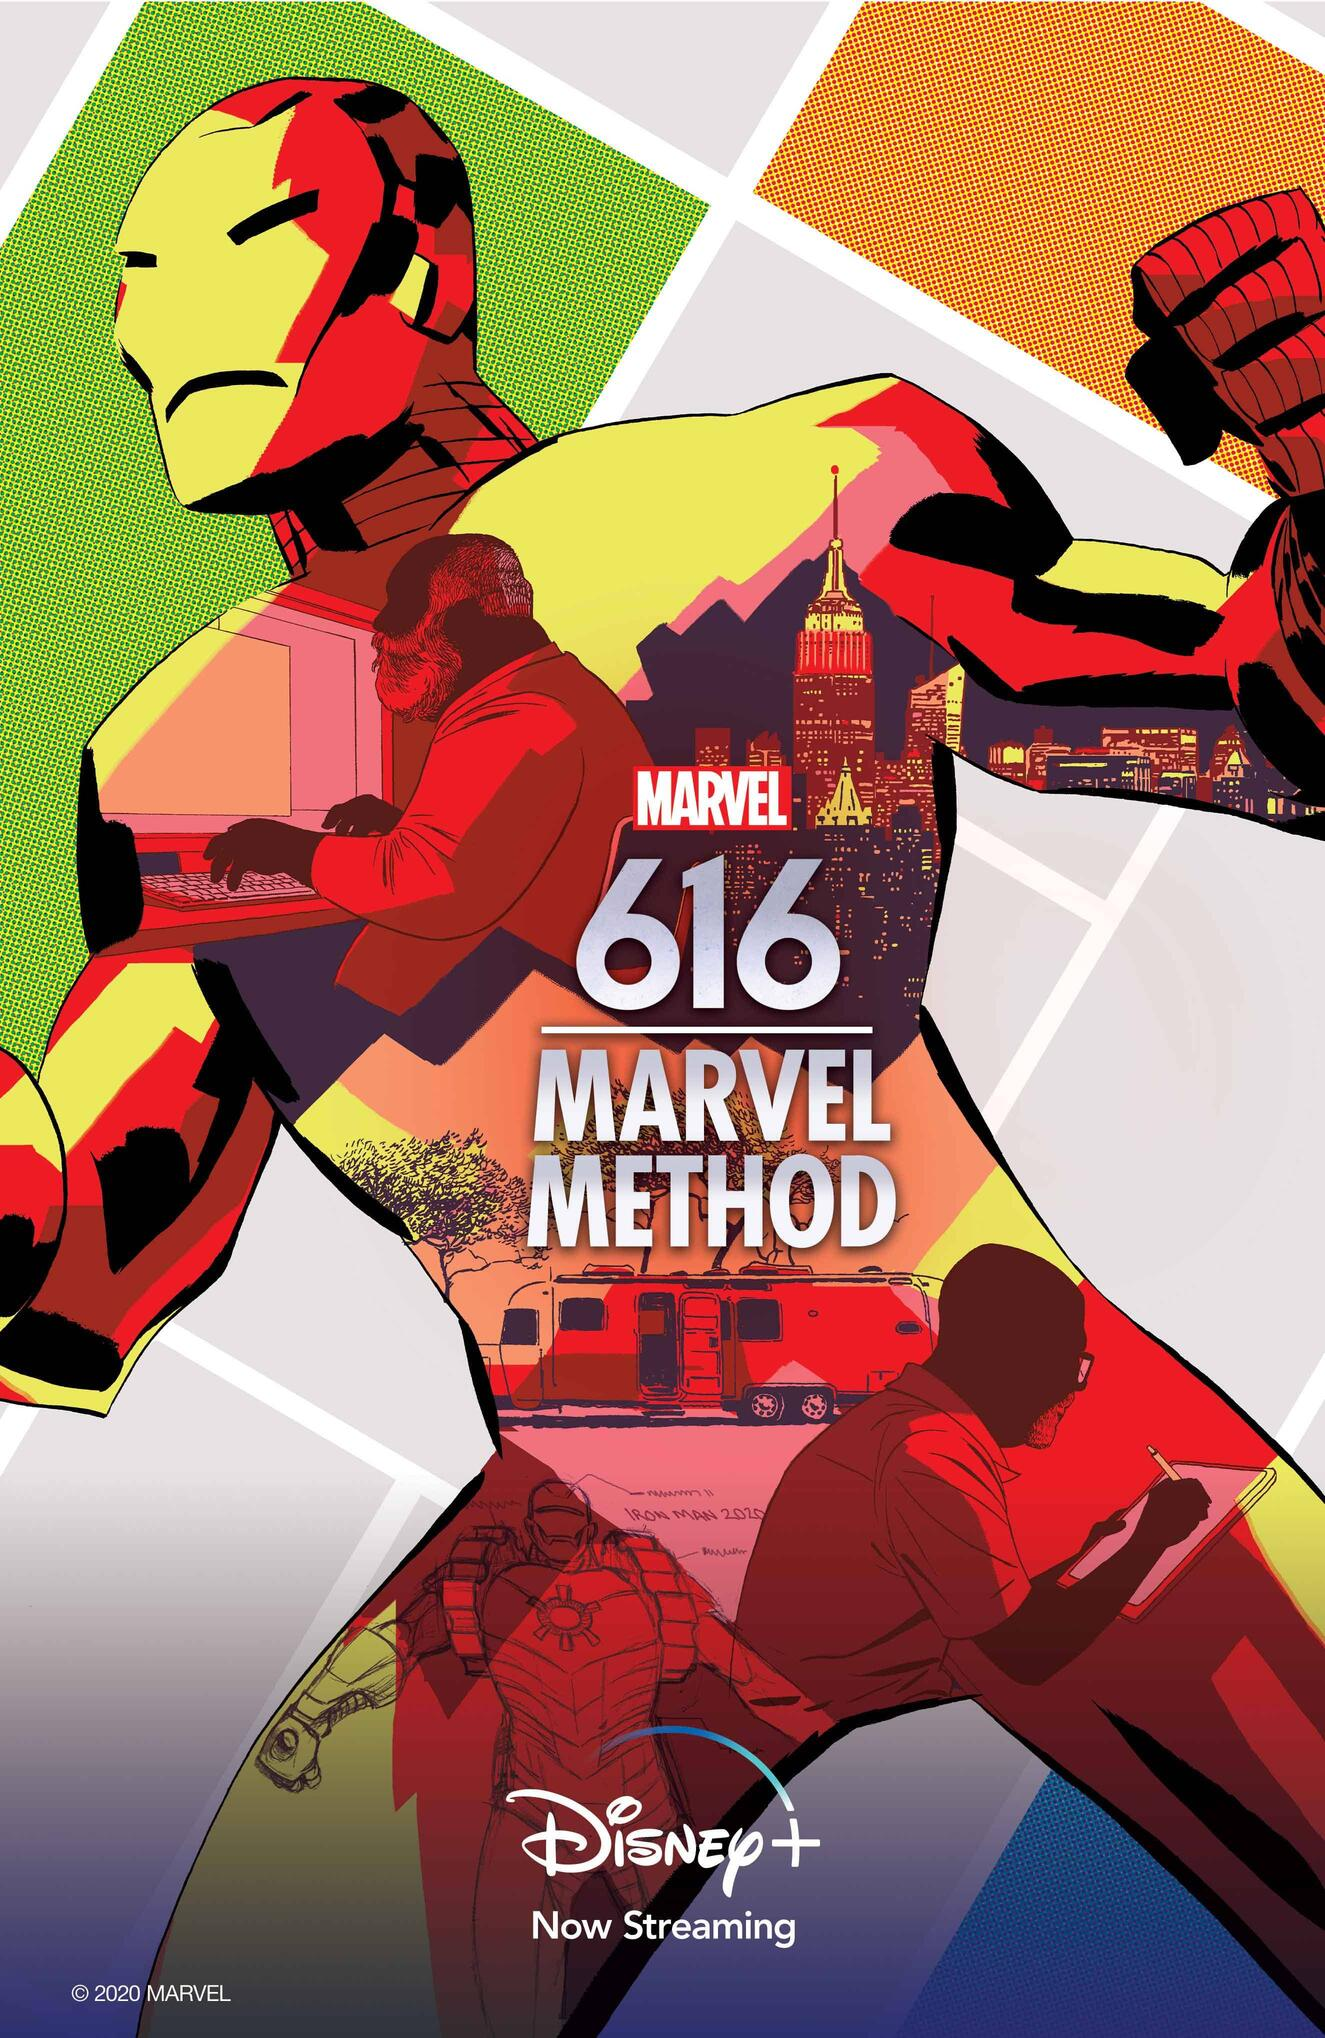 Marvel's 616 The Marvel Method